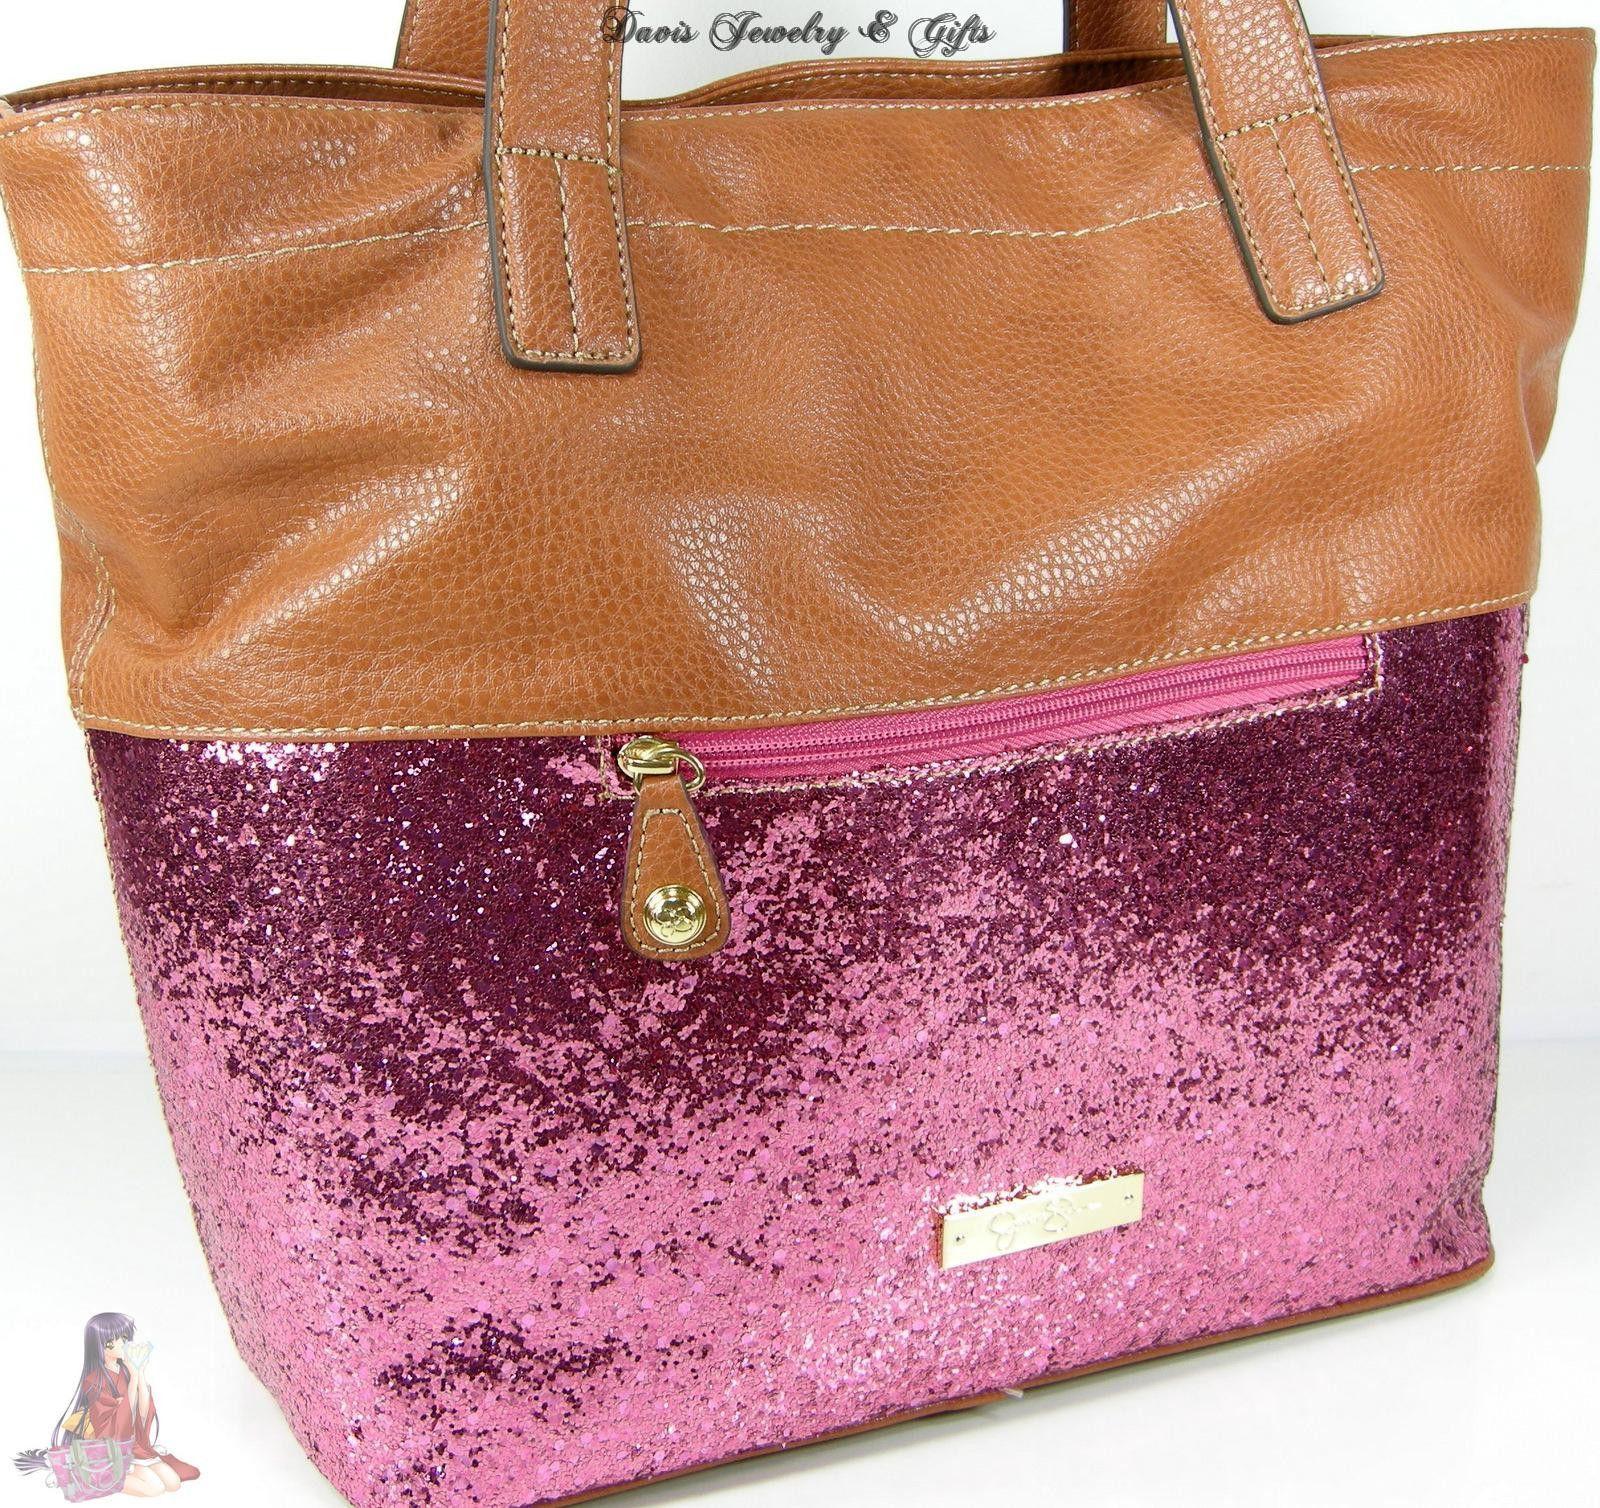 Jessica Simpson Purse Pink Saddle Beige Large Tote Glitter